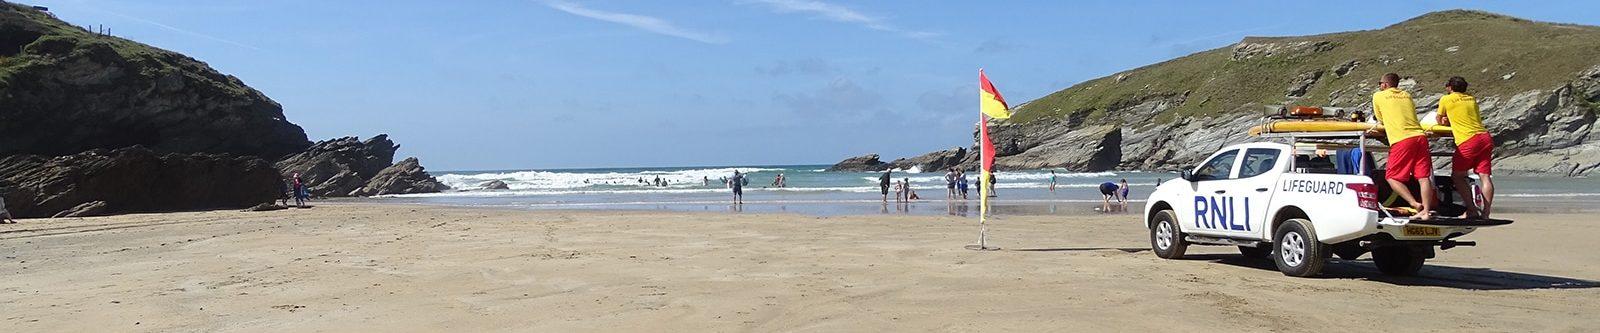 lifeguards on Porth beach